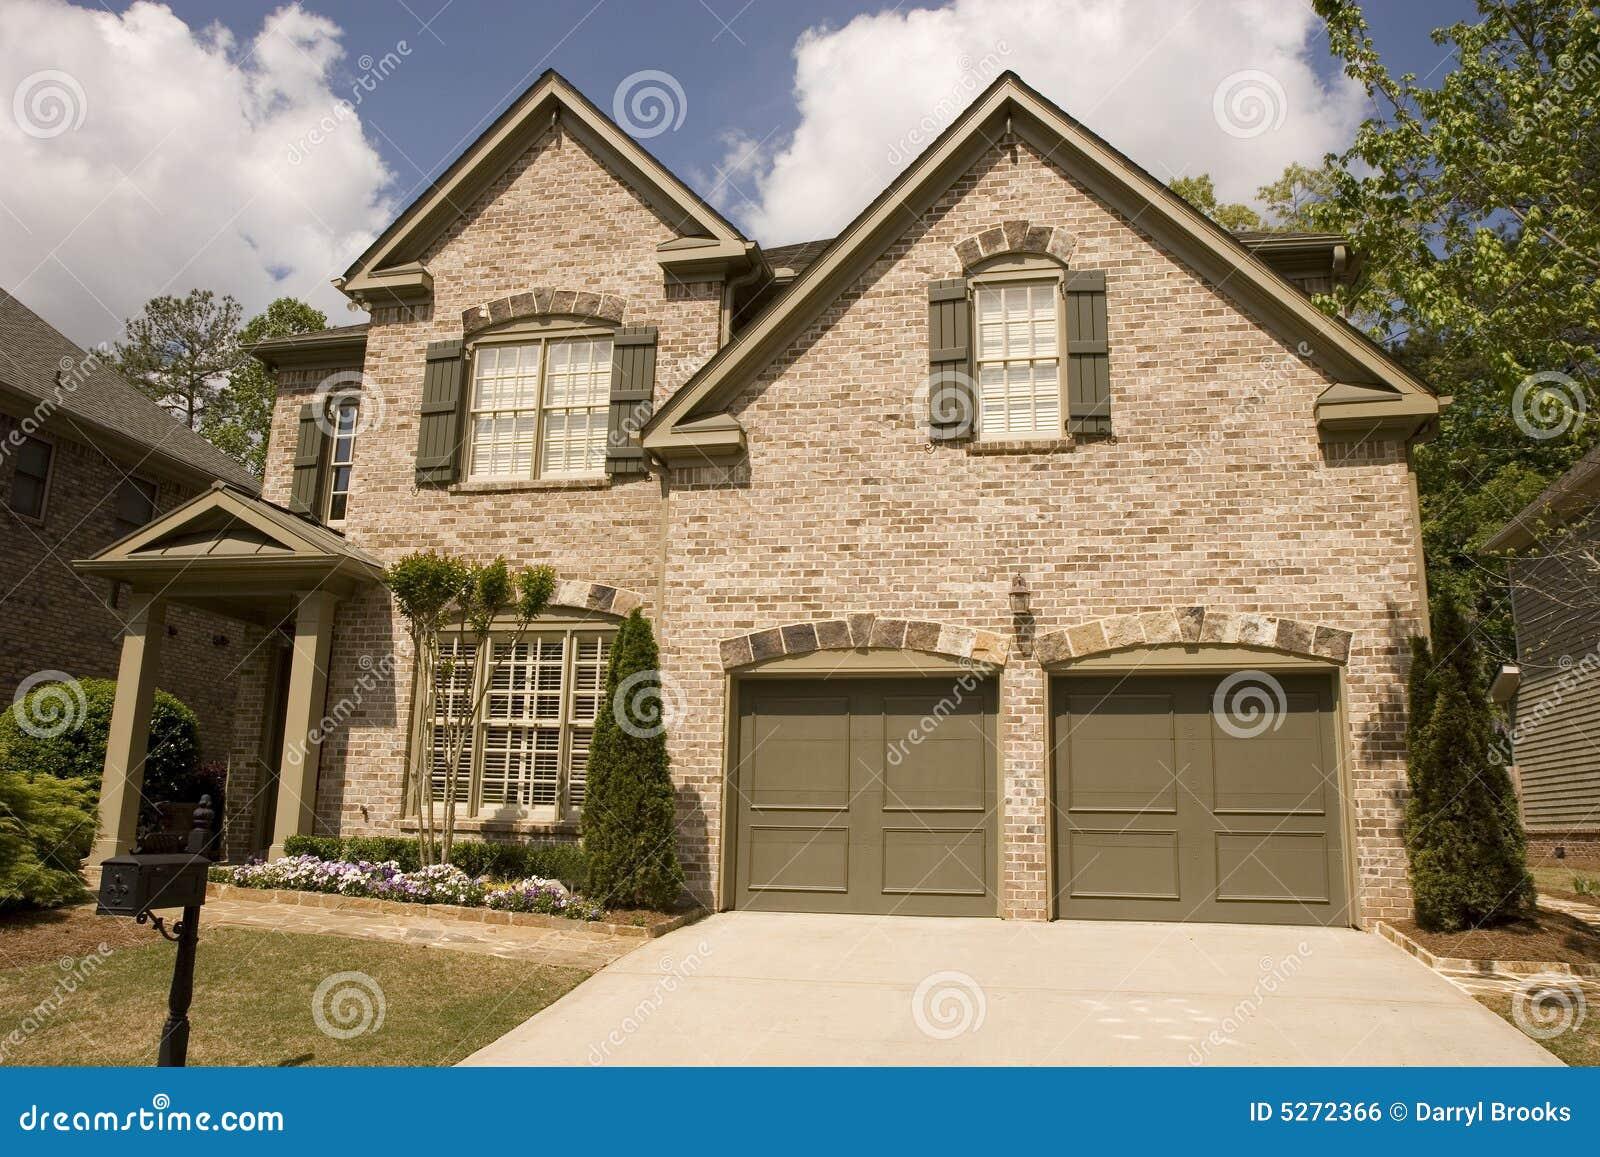 Brown brick two car garage royalty free stock image for Brick garages prices